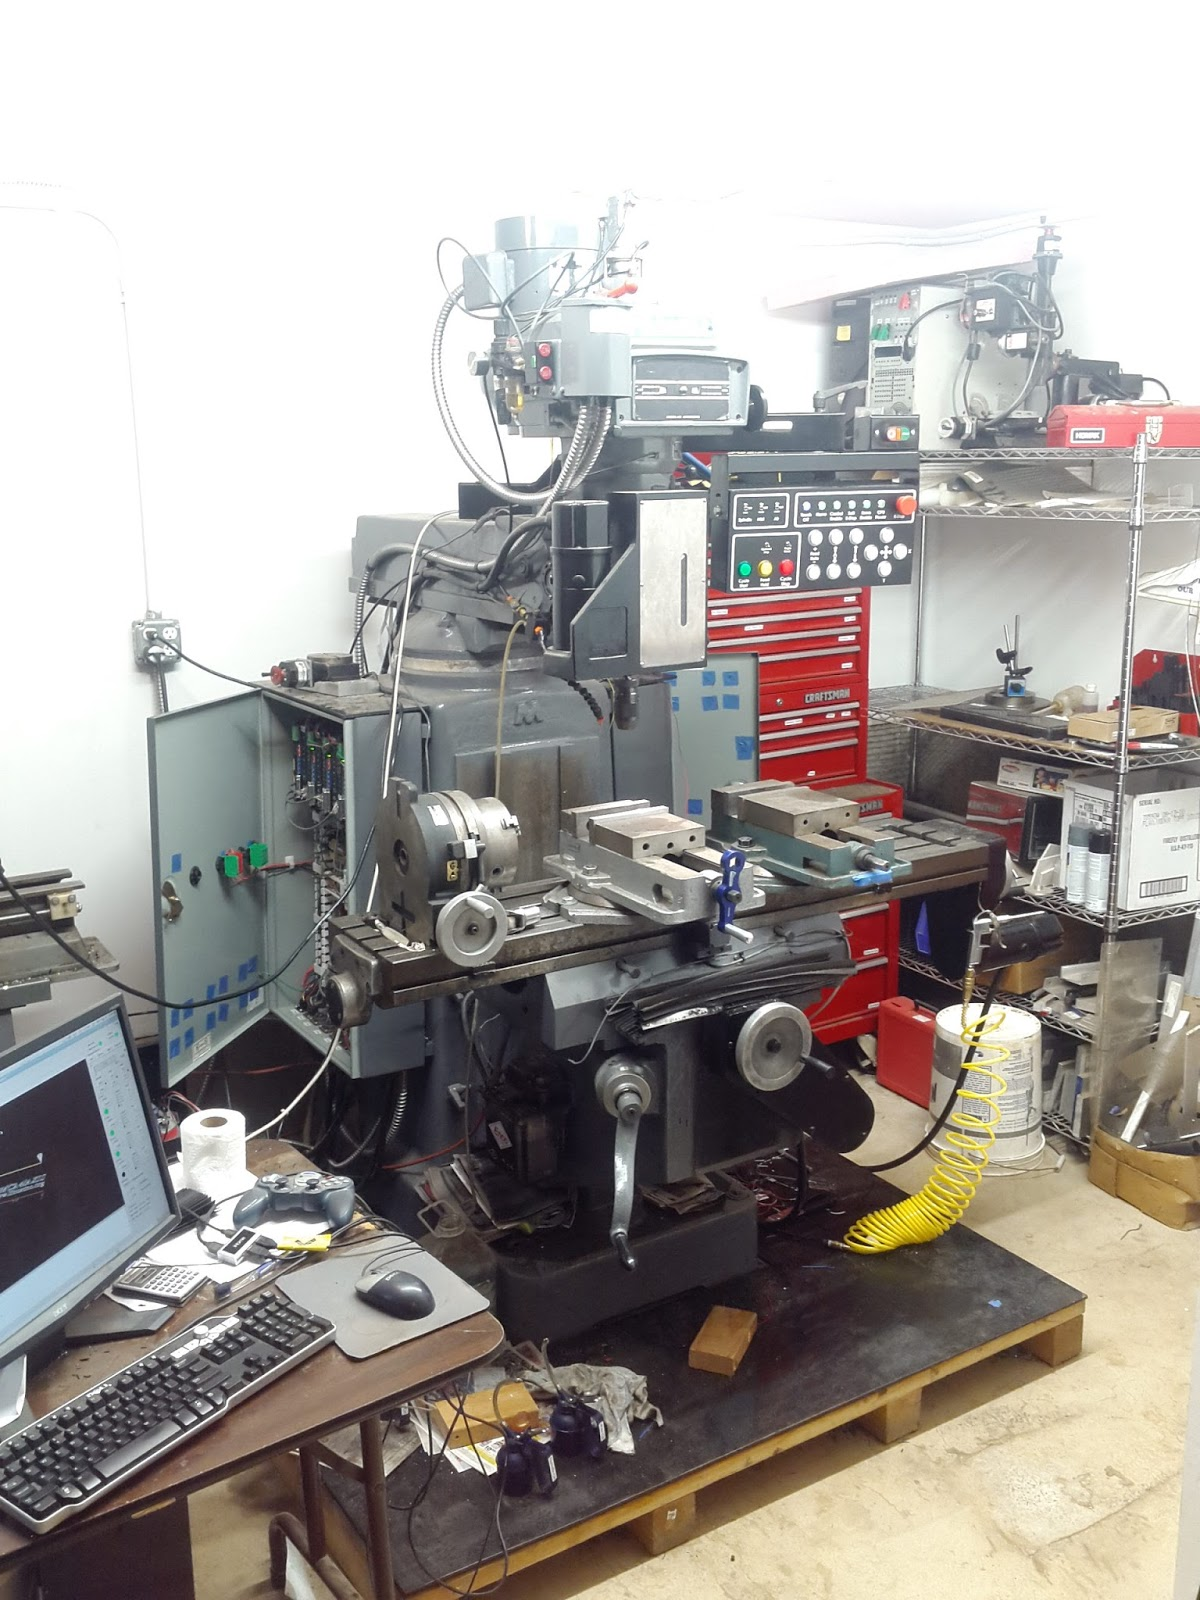 cnc milling machine projects